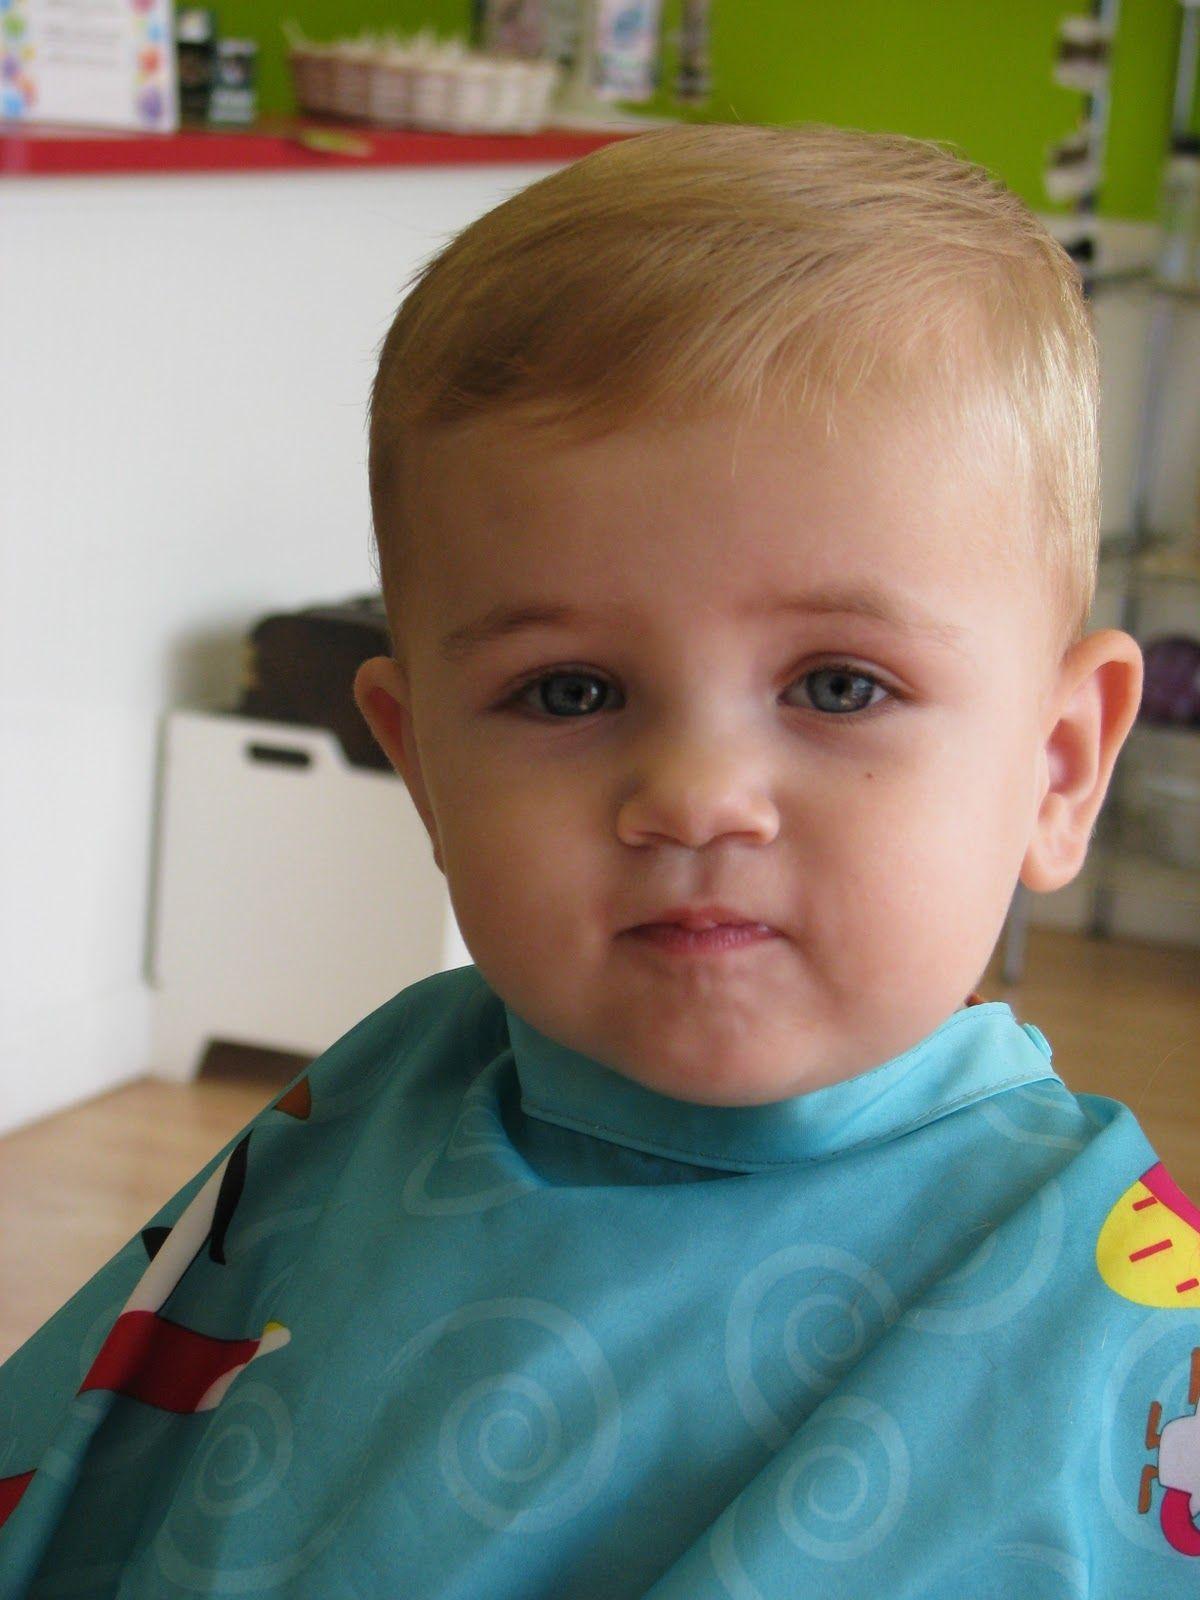 Baby boy haircut Haircuts for kids Pinterest